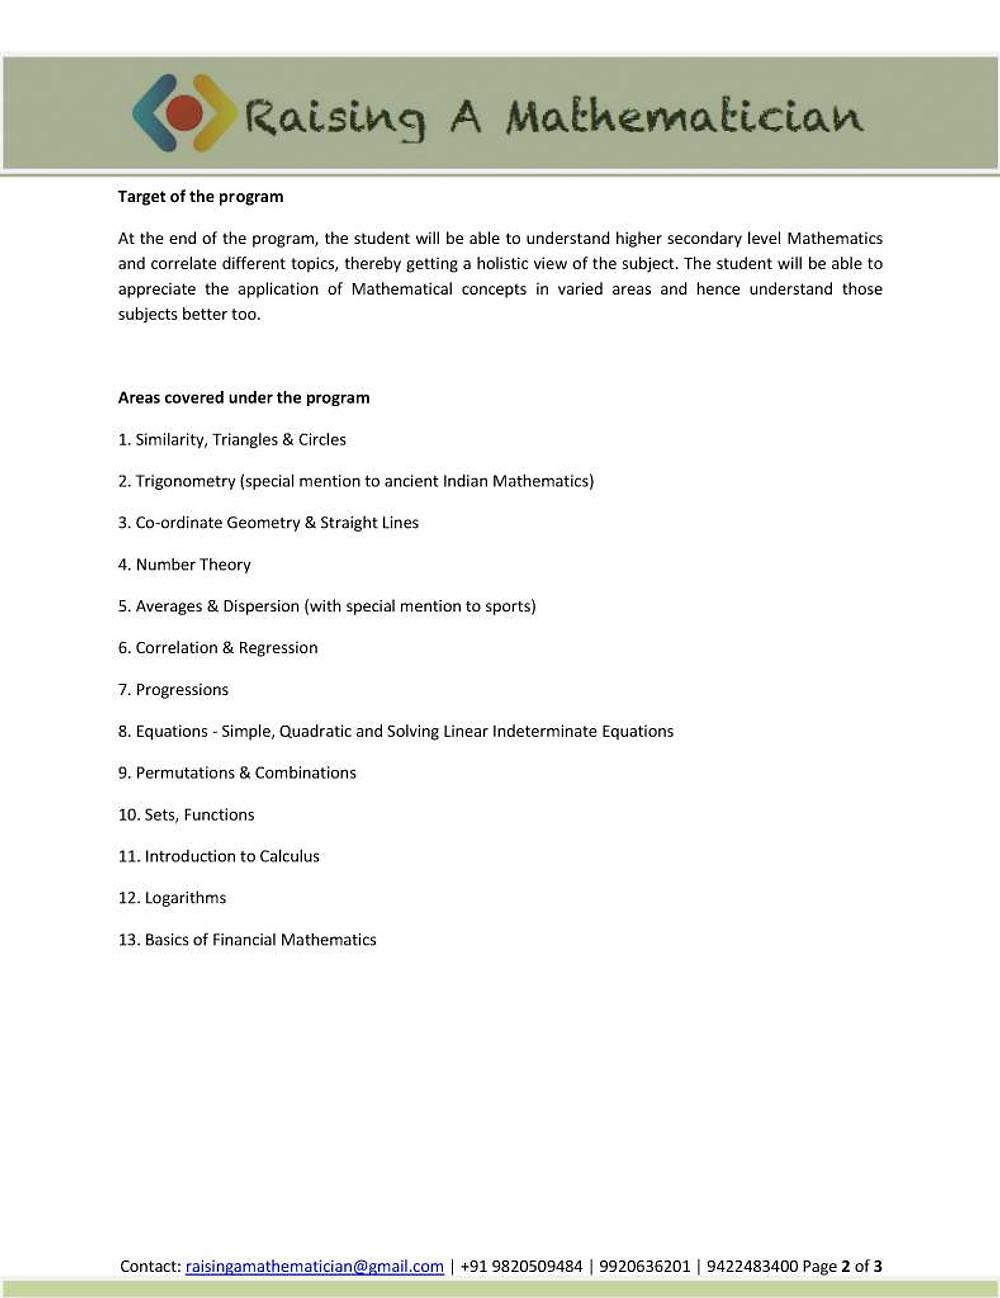 3. RAM brochure_Page_2